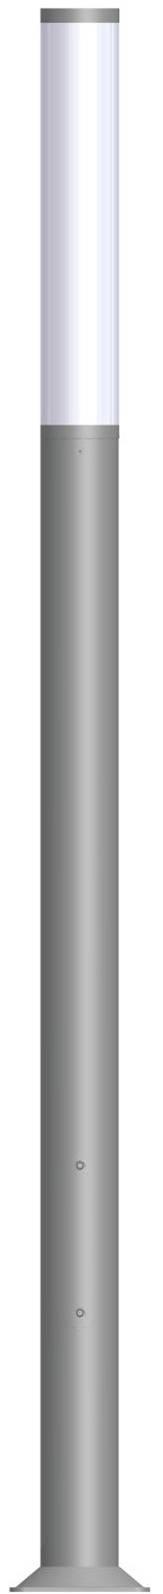 COLONNE LED KARIN 3600 LED